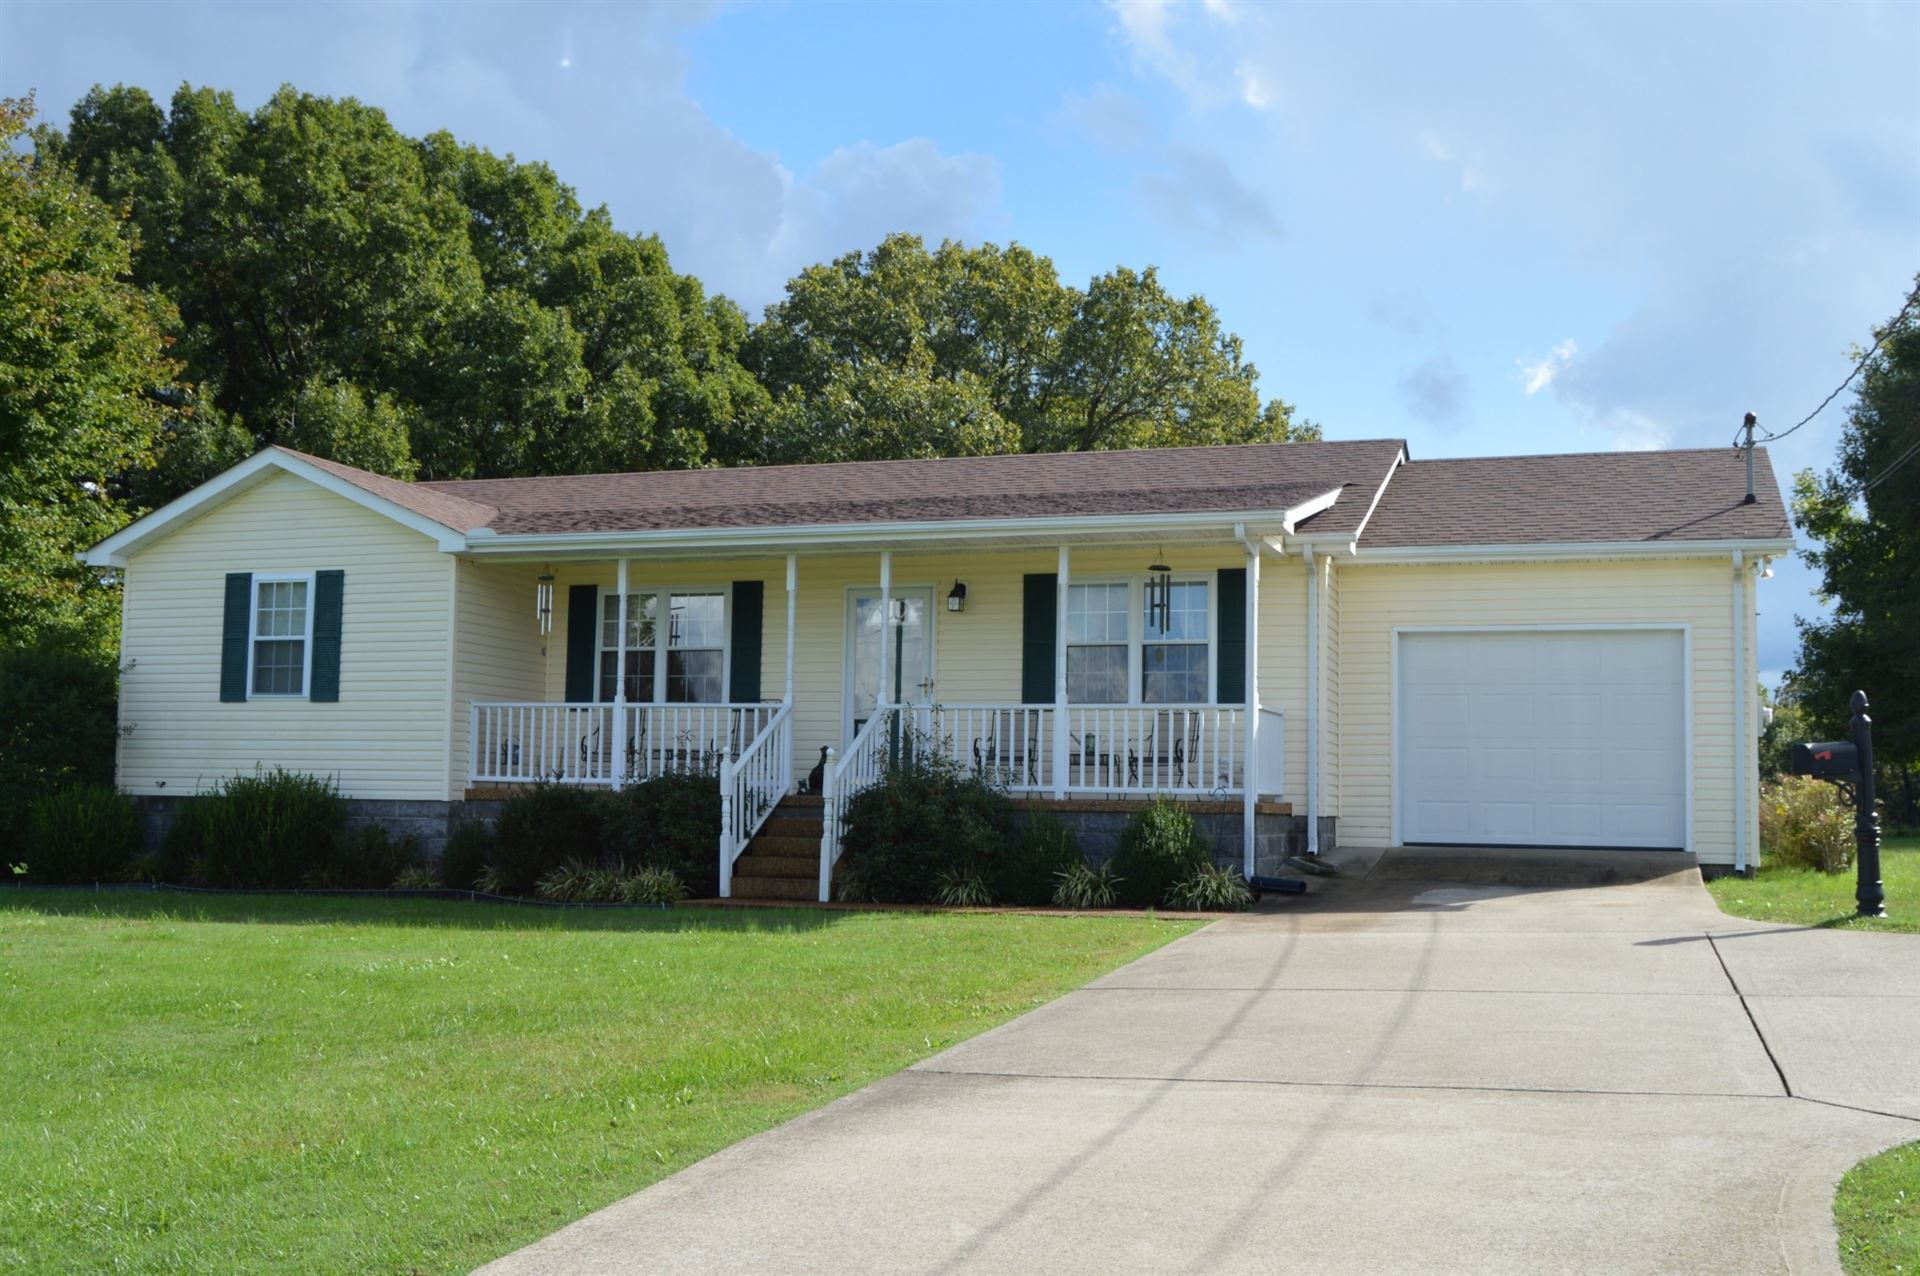 1955 MOBLEY LANE, Erin, TN 37061 - MLS#: 2298103